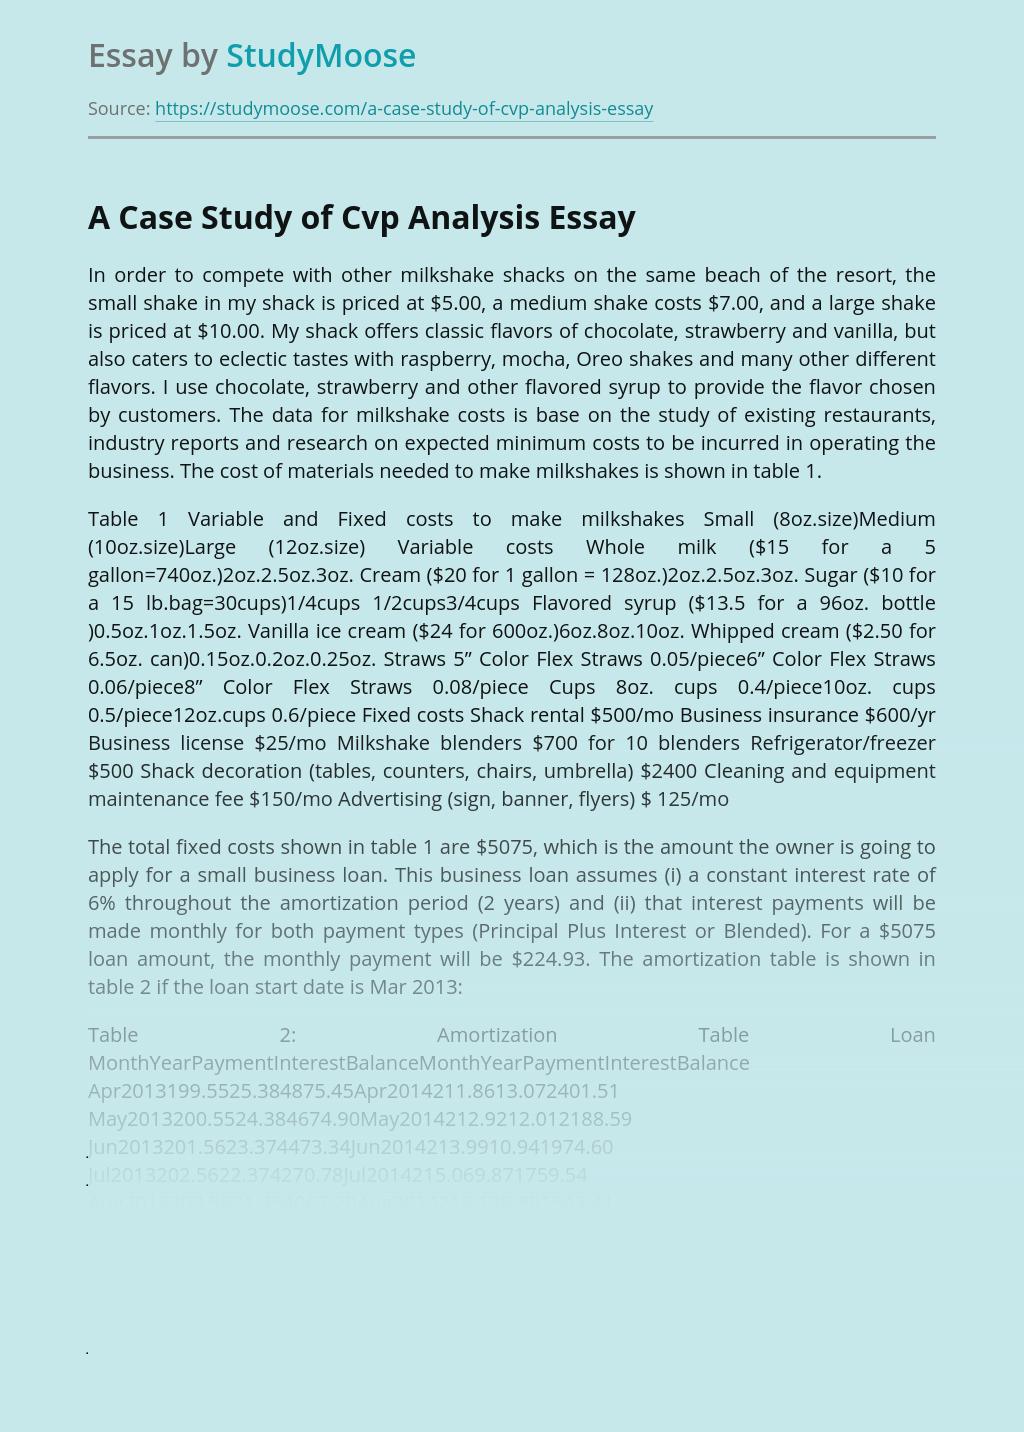 A Case Study of Cvp Analysis